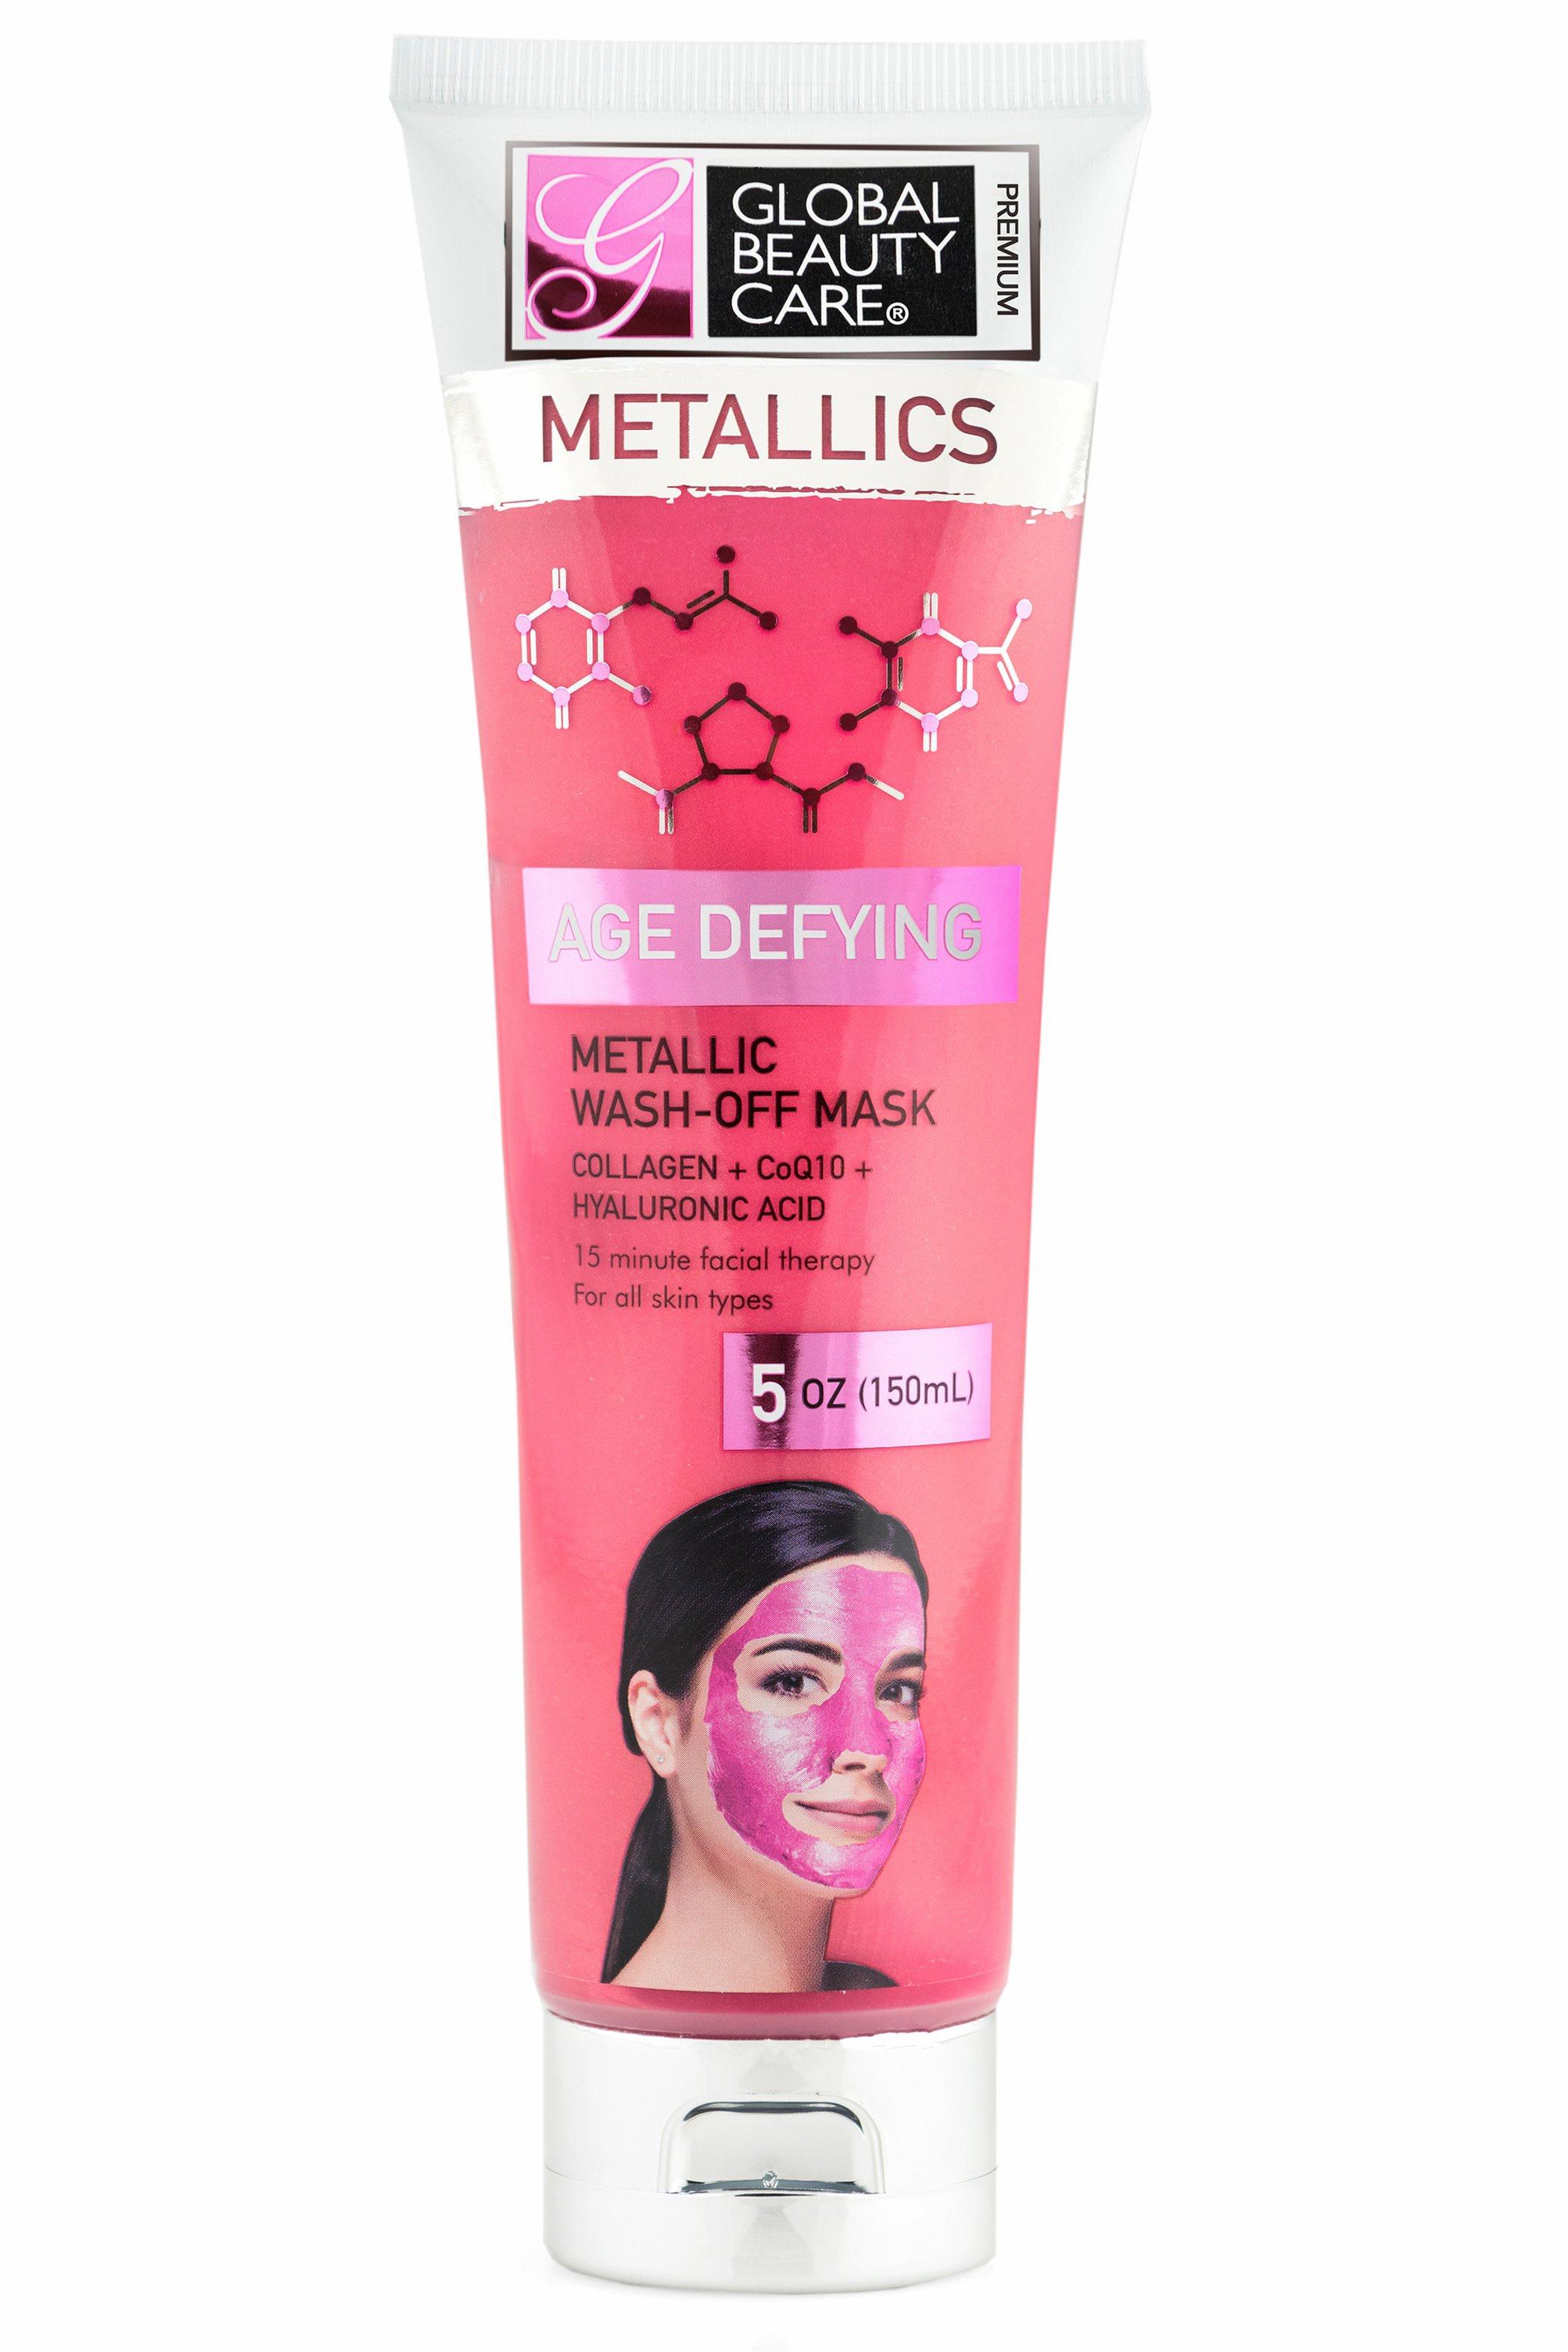 Global Beauty Care Premium Metallic Wash Off Mask